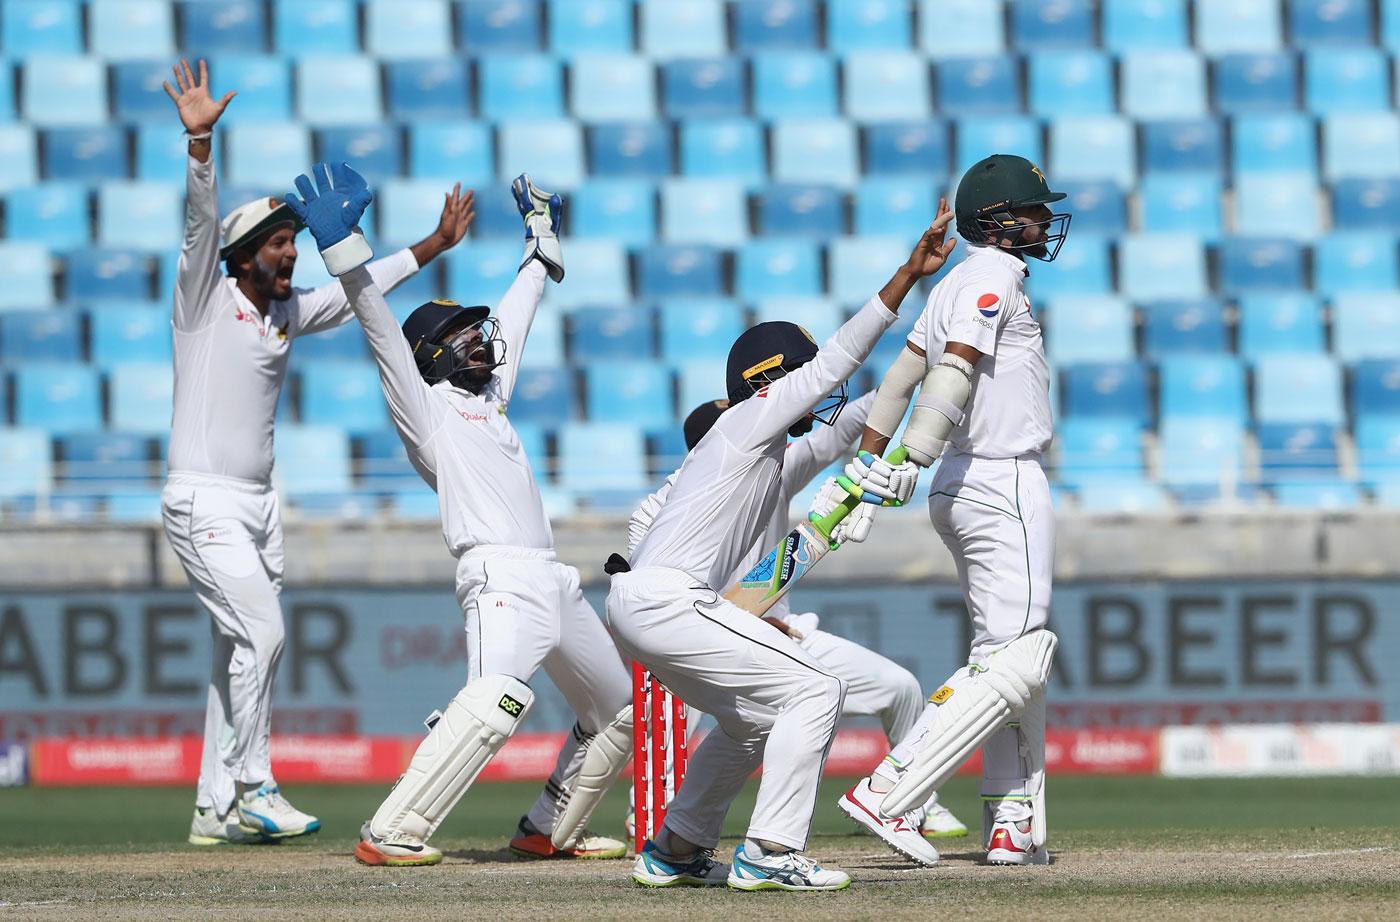 Pakistan vs Sri Lanka 2nd Test Day 5